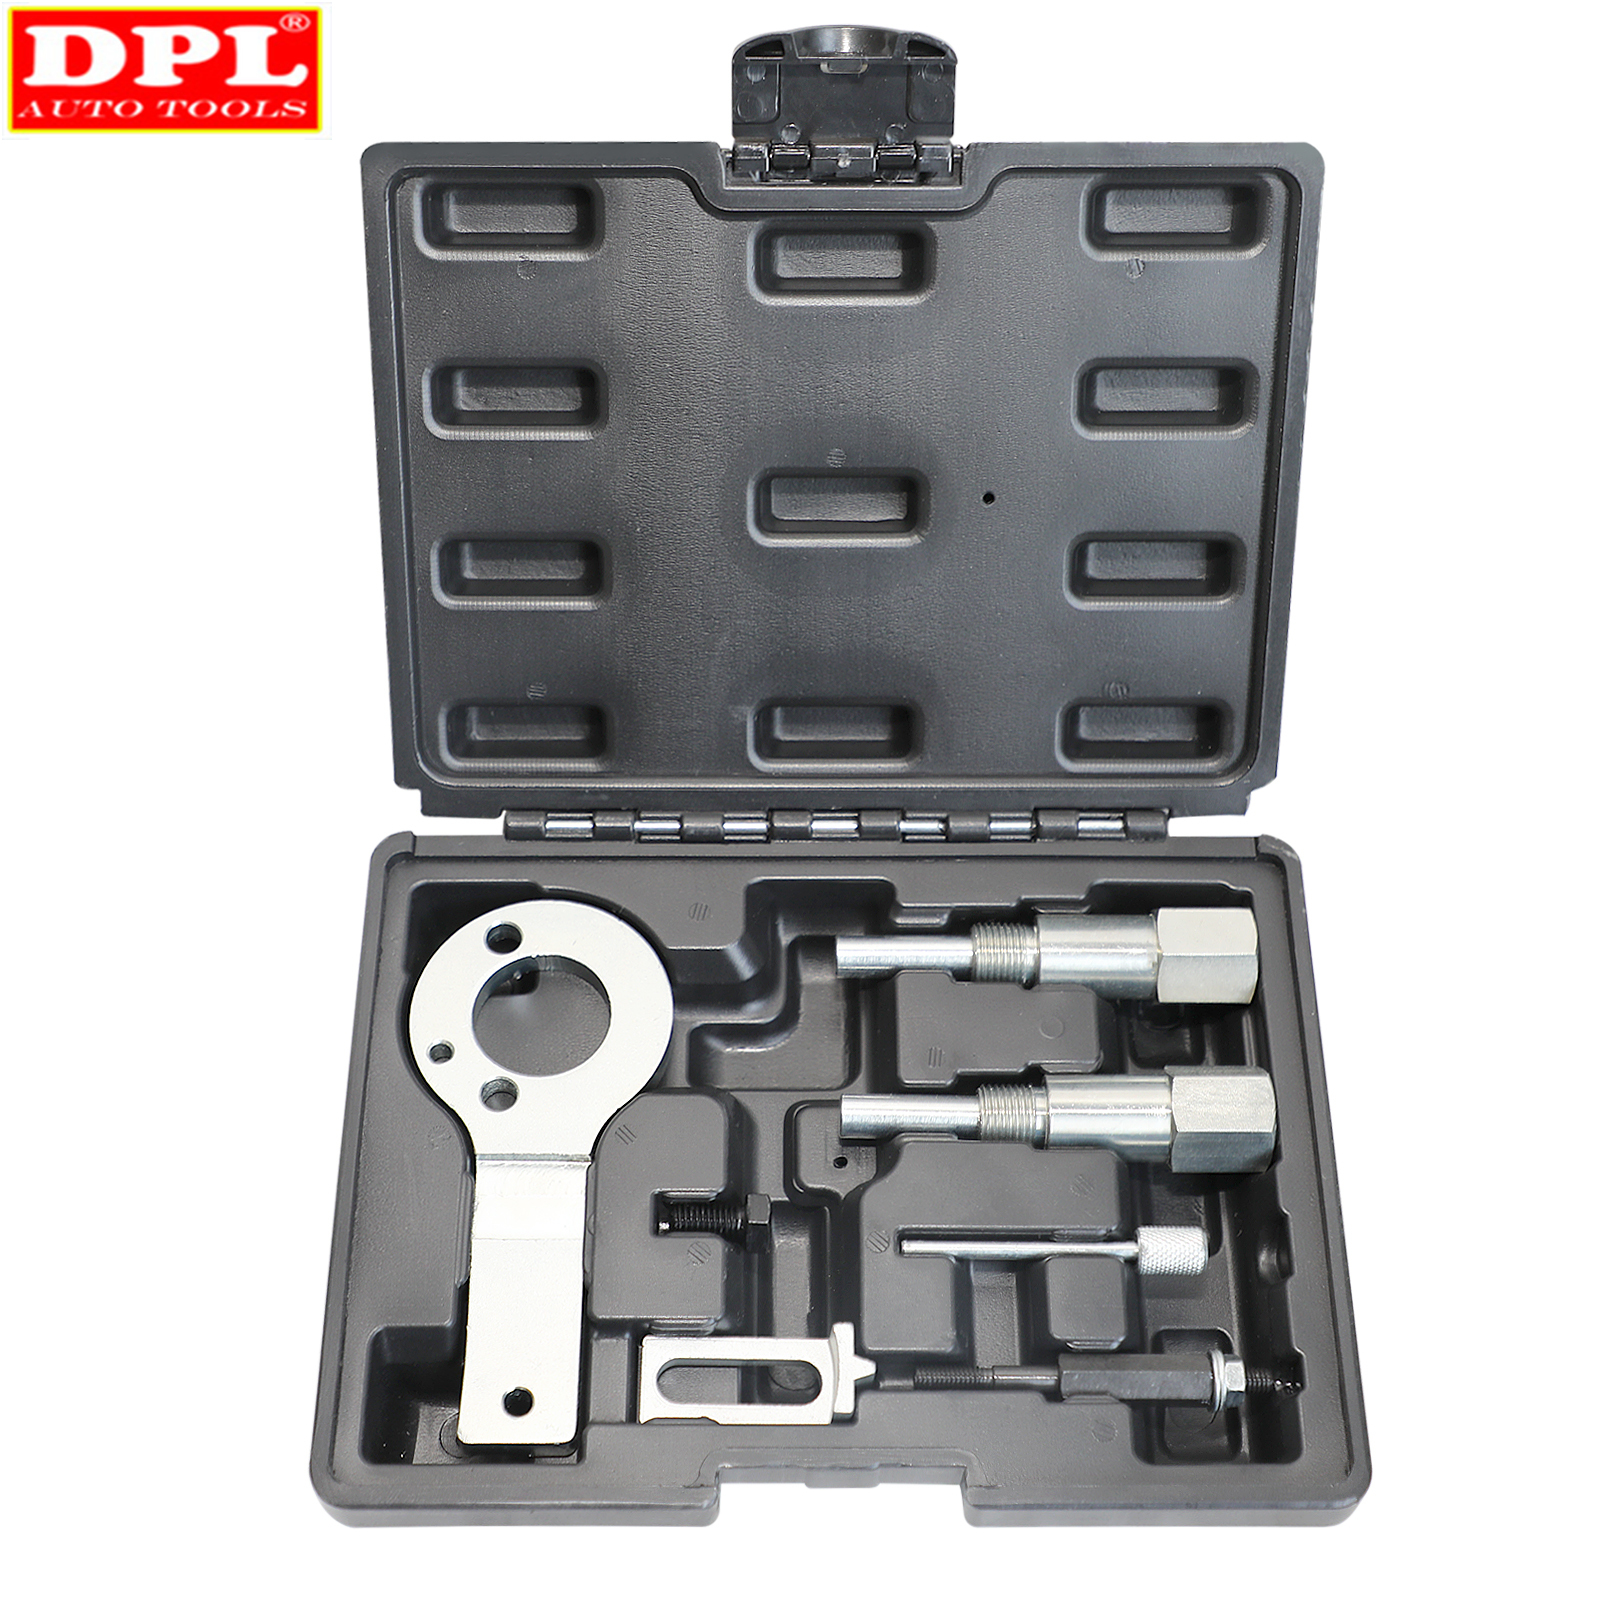 Auto Engine Timing Camshaft Flywheel Locking Repair Garage Tool For Alfa Romeo 1.9 8/16V 2.4 10/20V For Vauxhall Fiat 1.9